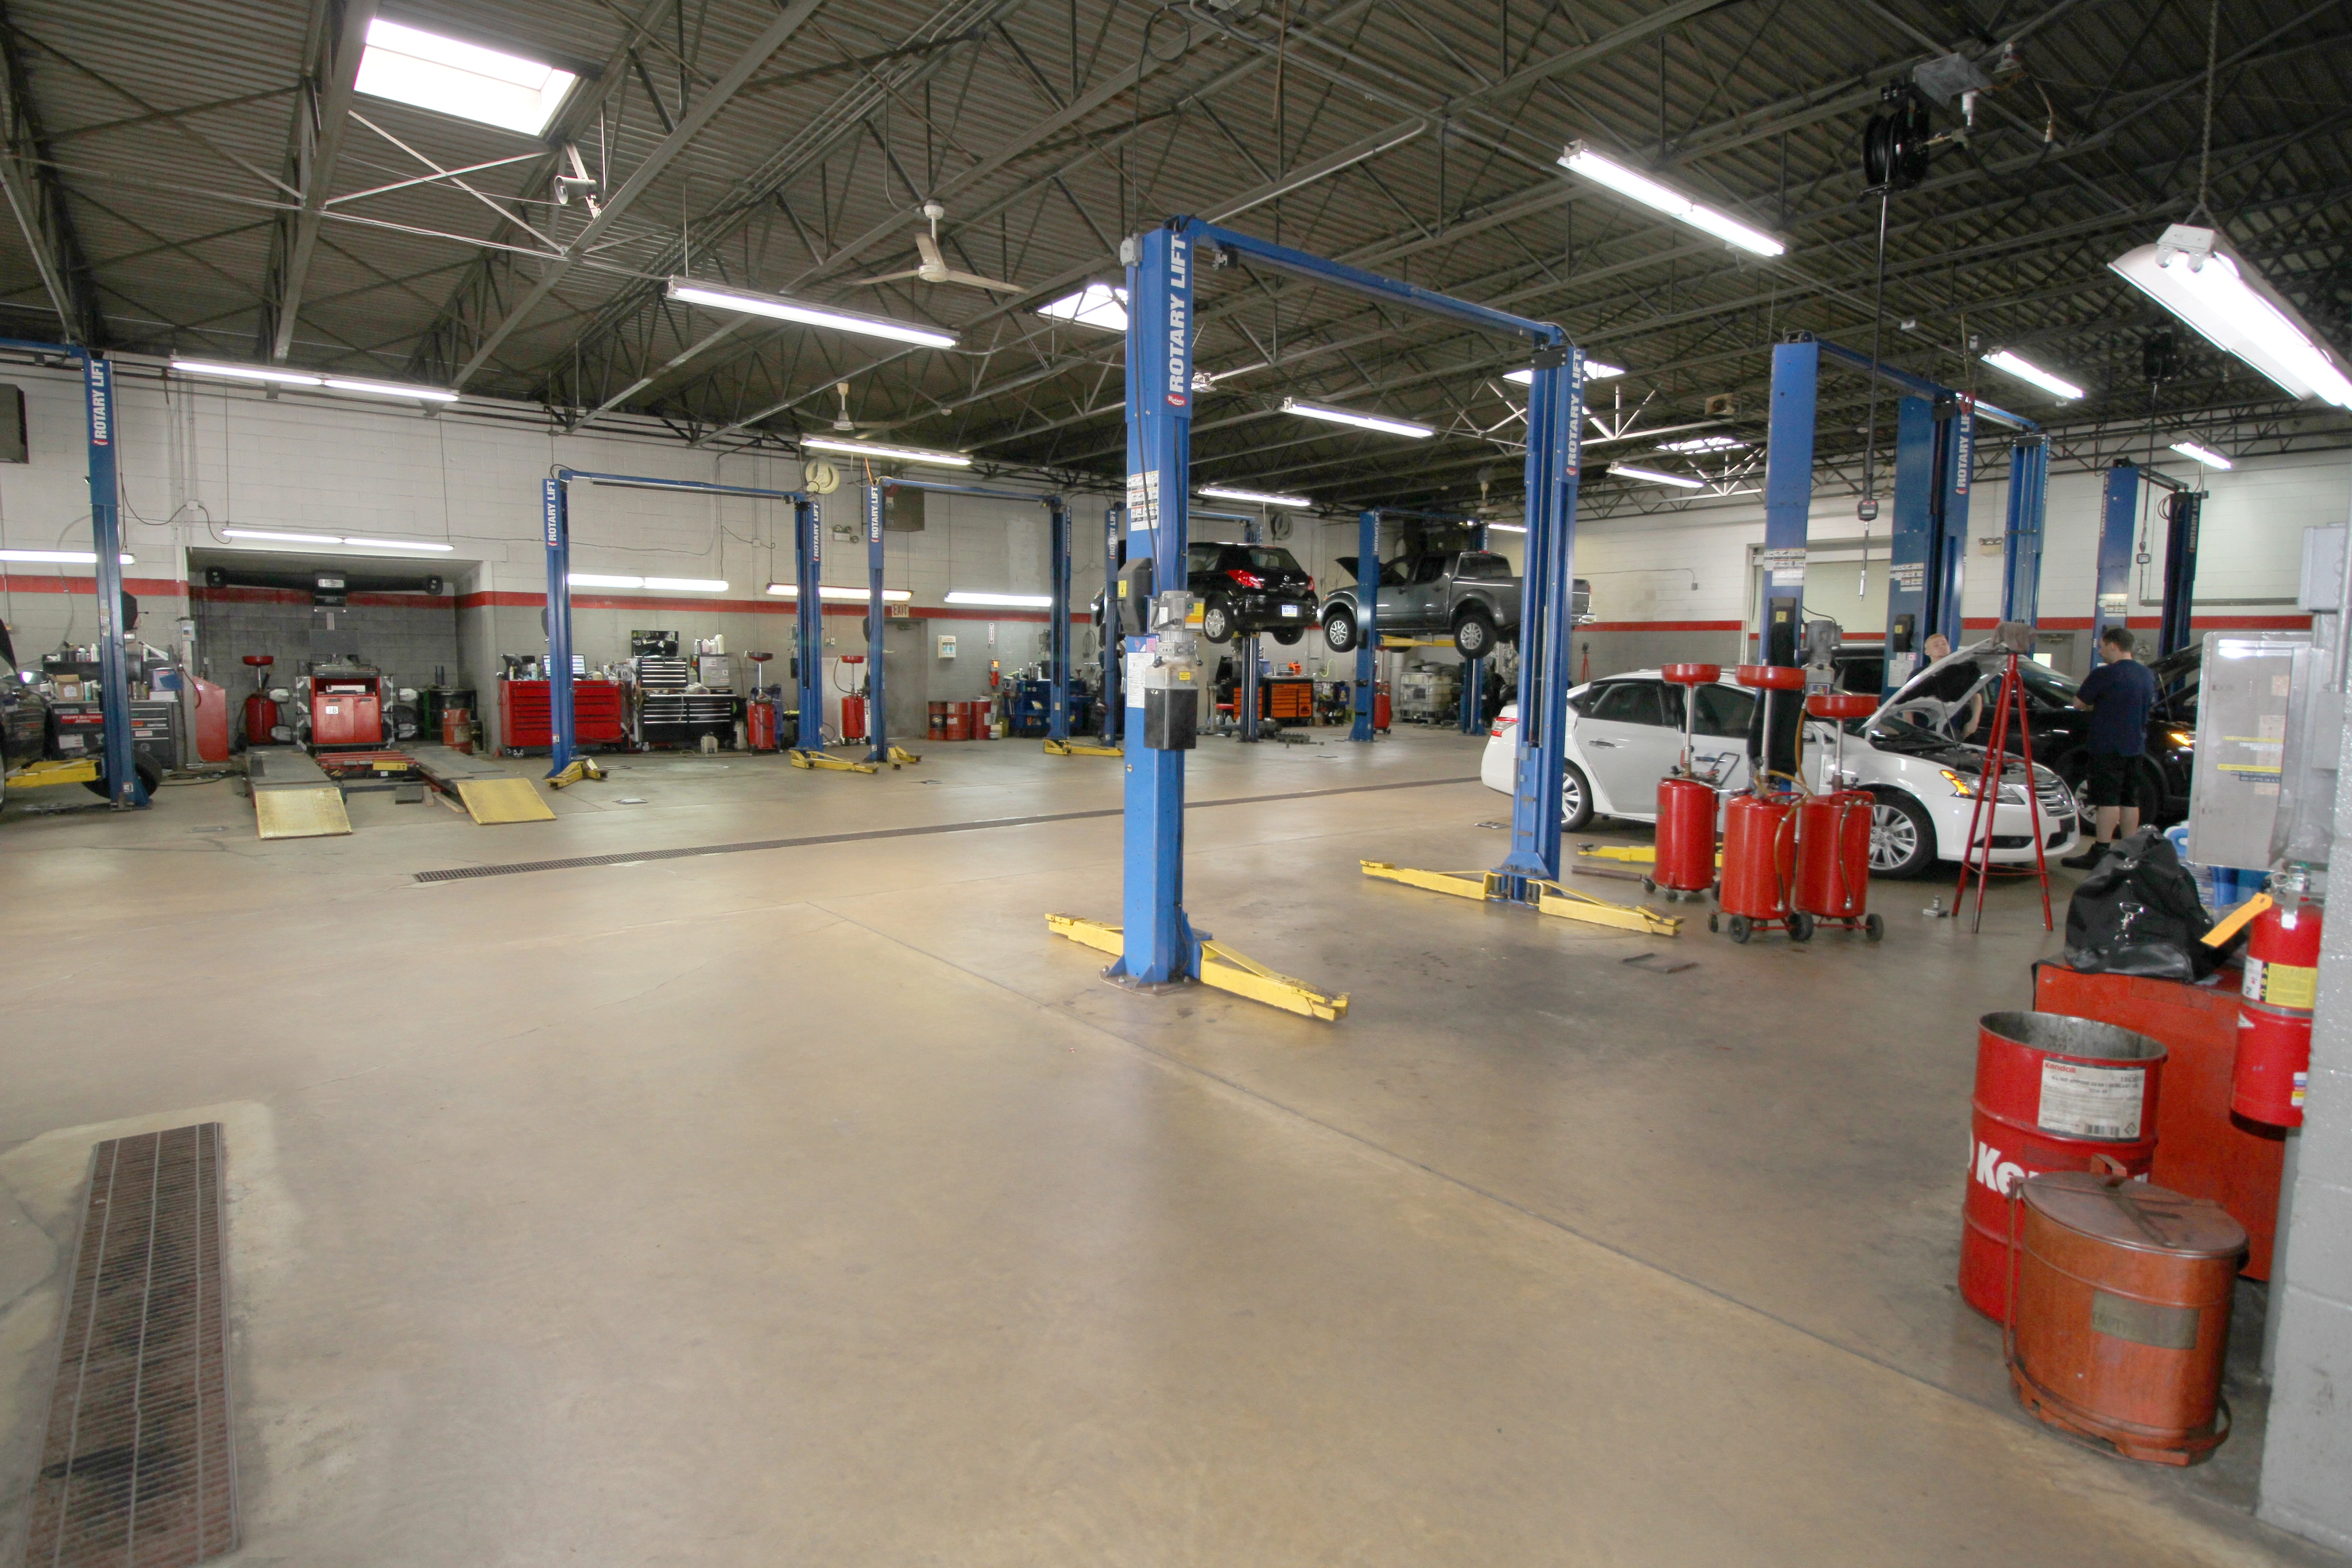 nissan auto repair services apple service center york pa